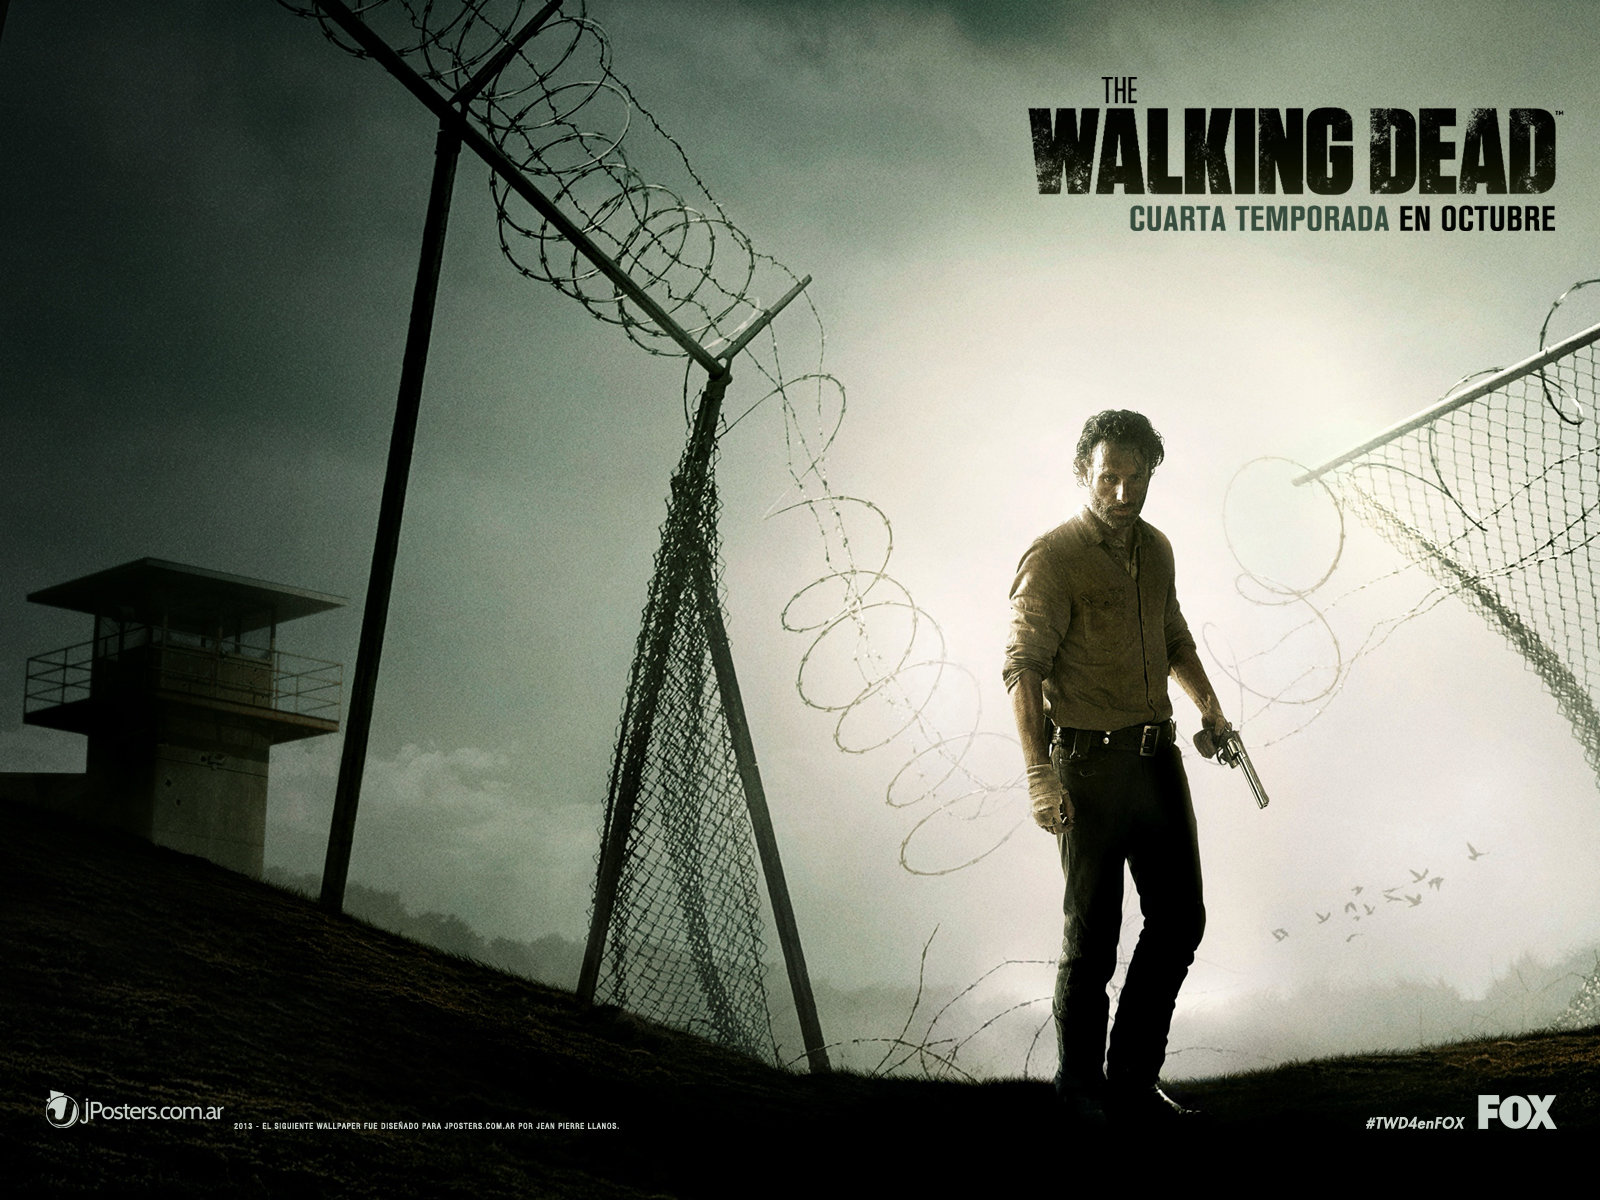 Wallpaper latino para la 4ta Temporada de THE WALKING DEAD (Diferentes